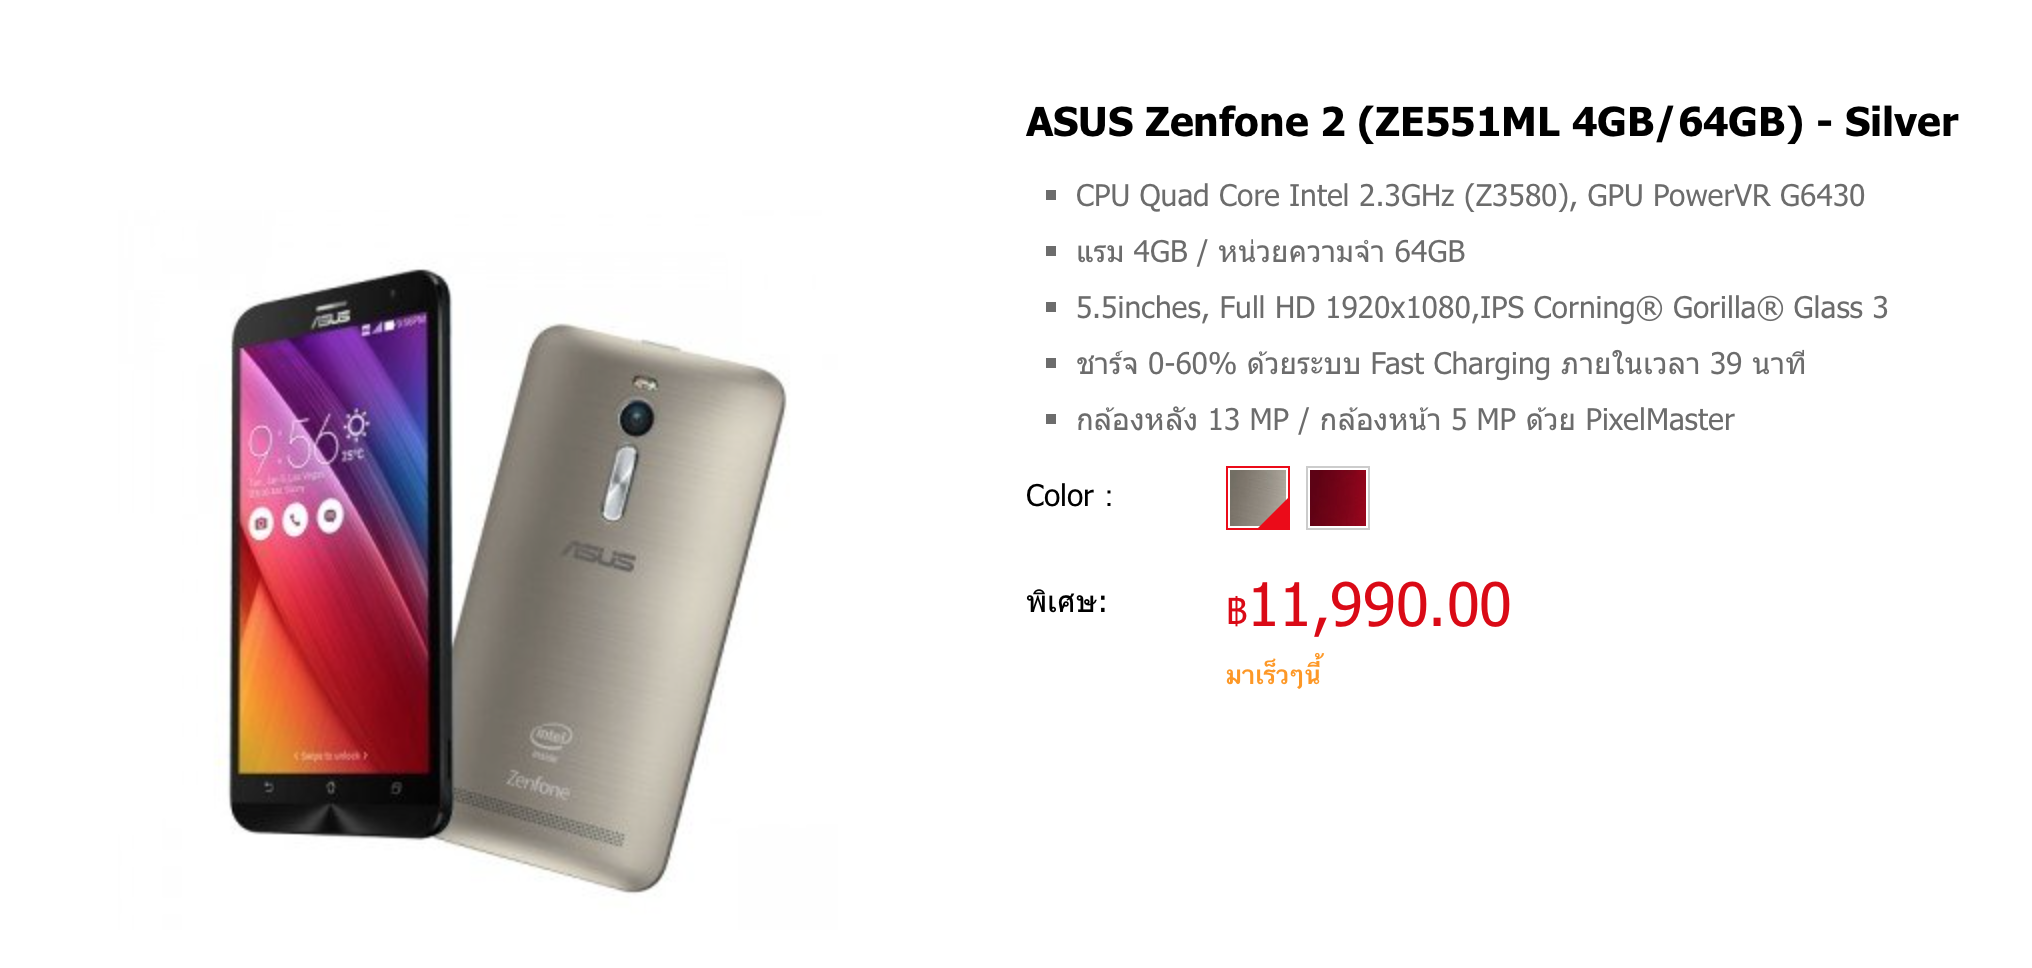 Asus-Store-Thailand-Zenfone-2-001